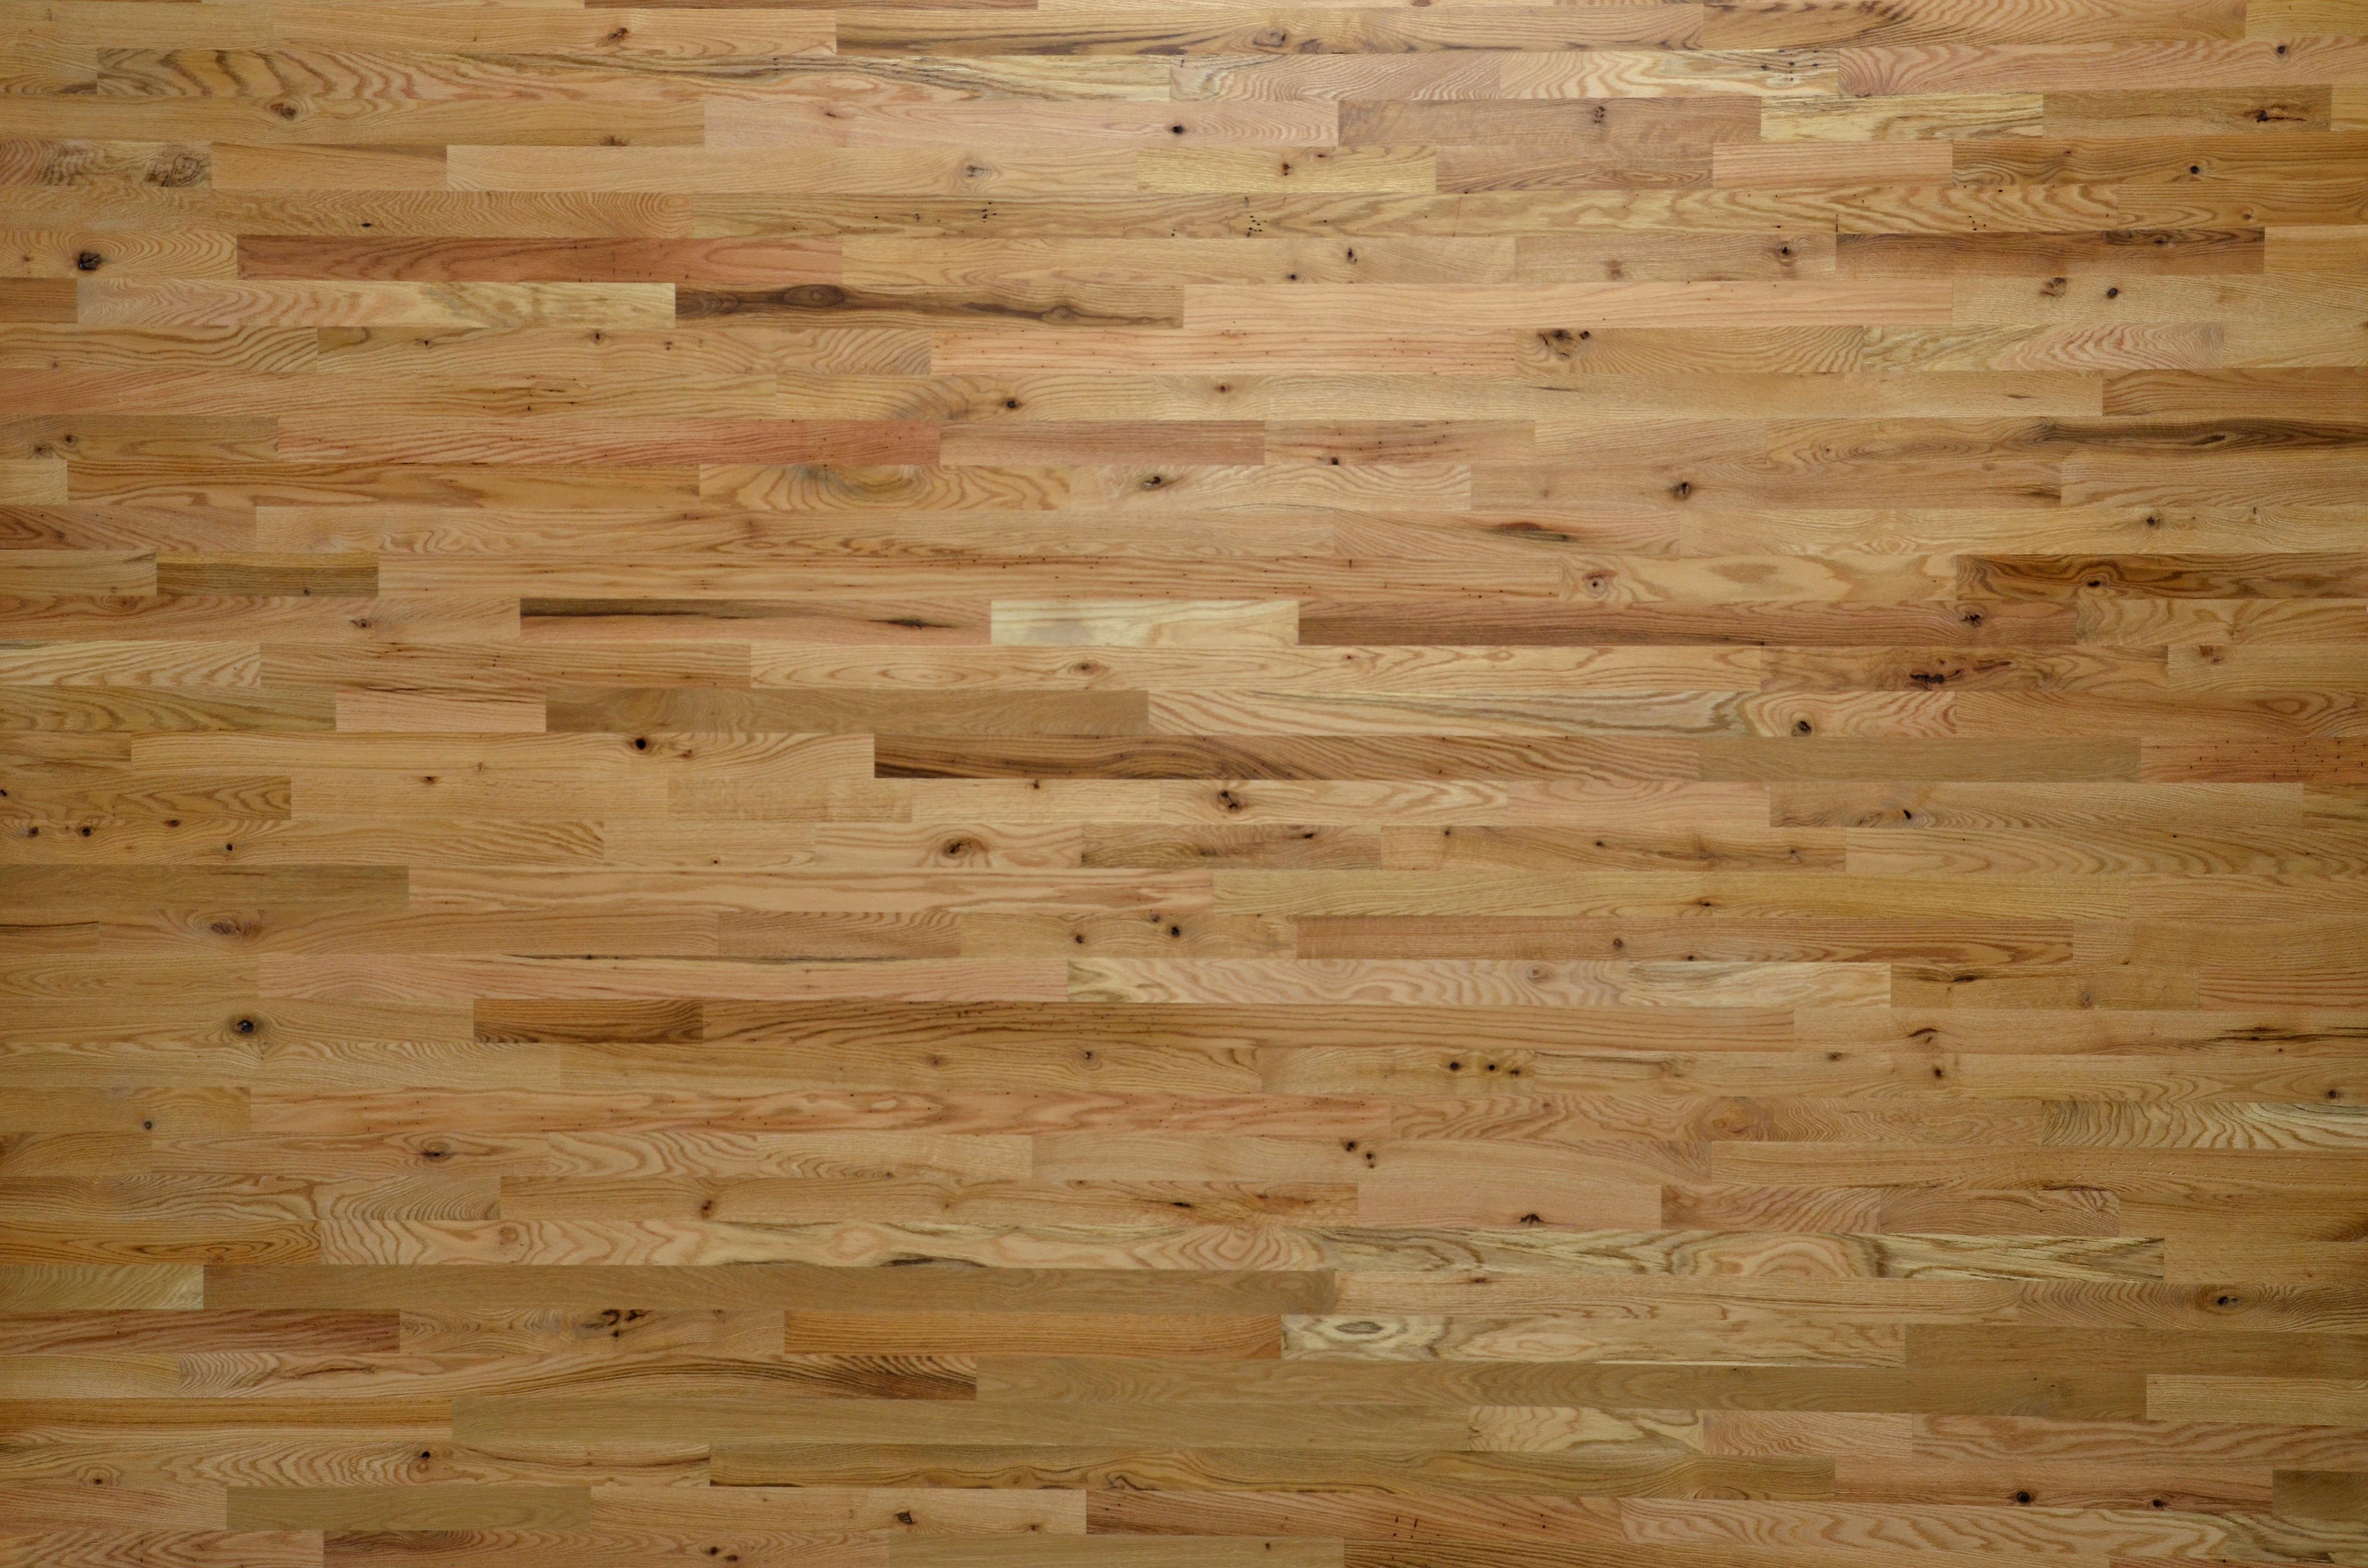 how to make wood filler with sawdust for hardwood floors of lacrosse hardwood flooring walnut white oak red oak hickory regarding 2 common red oak